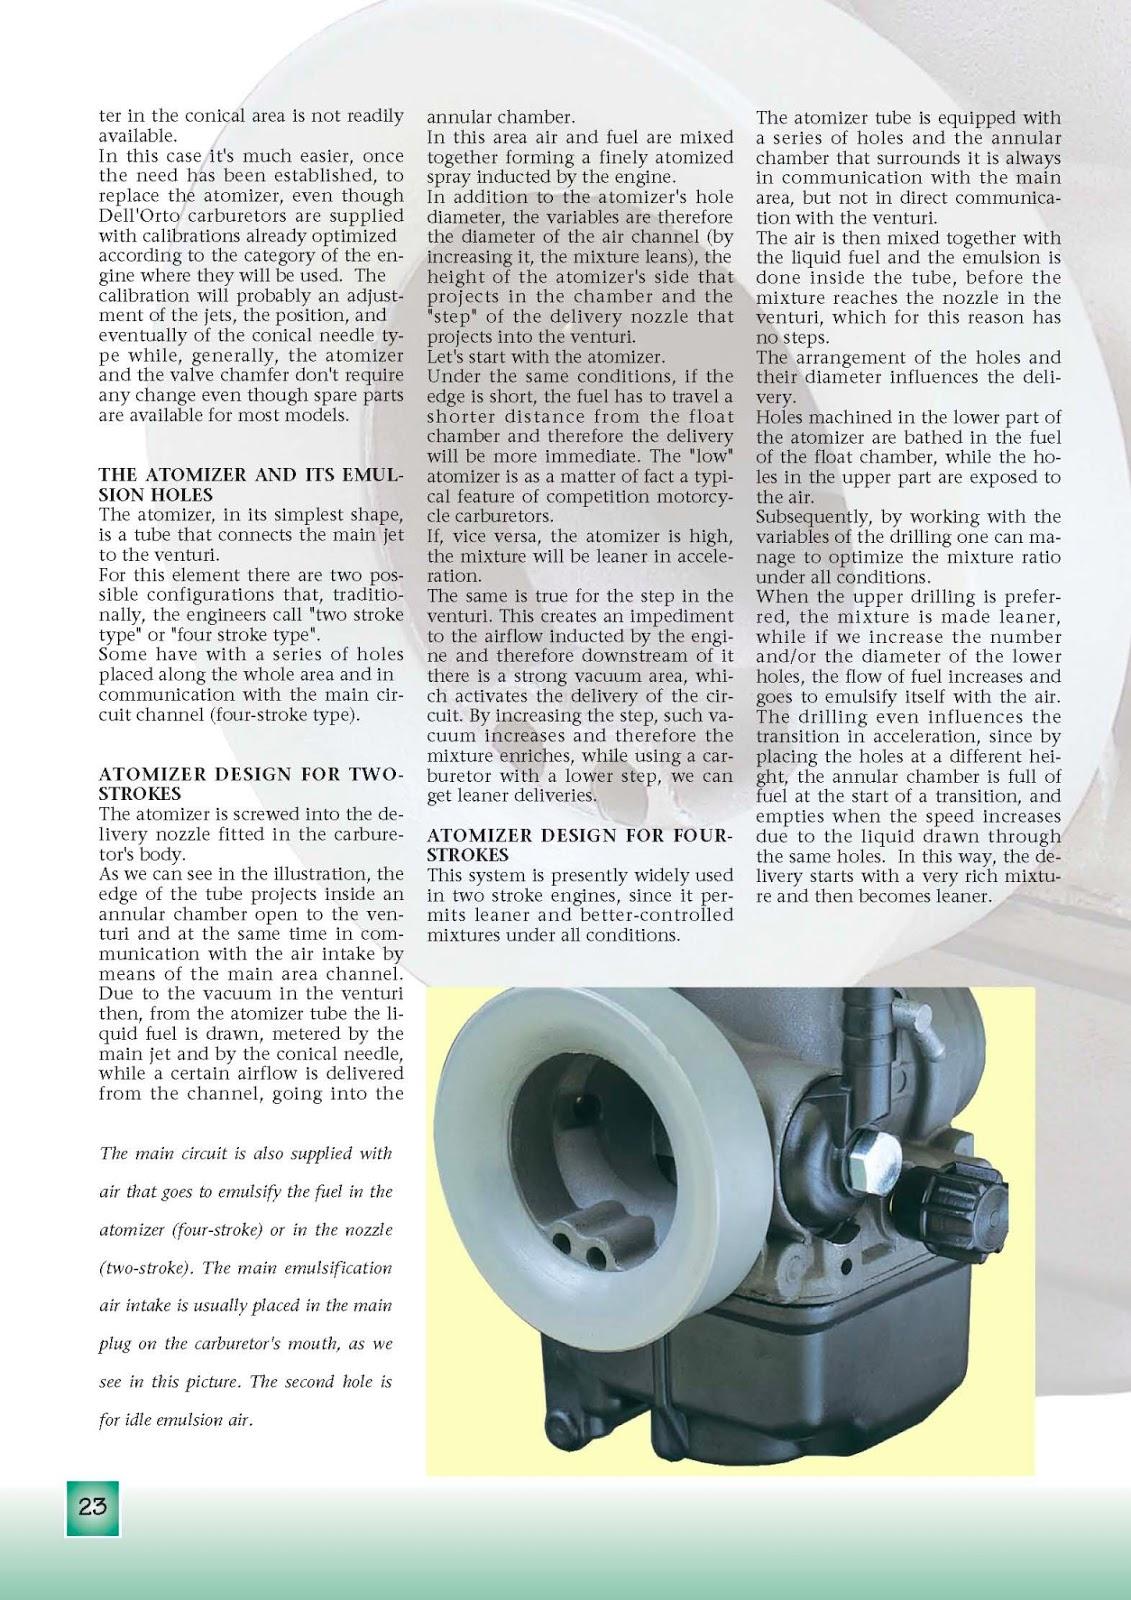 OB1 Repairs: Dellorto Carburetor Manual